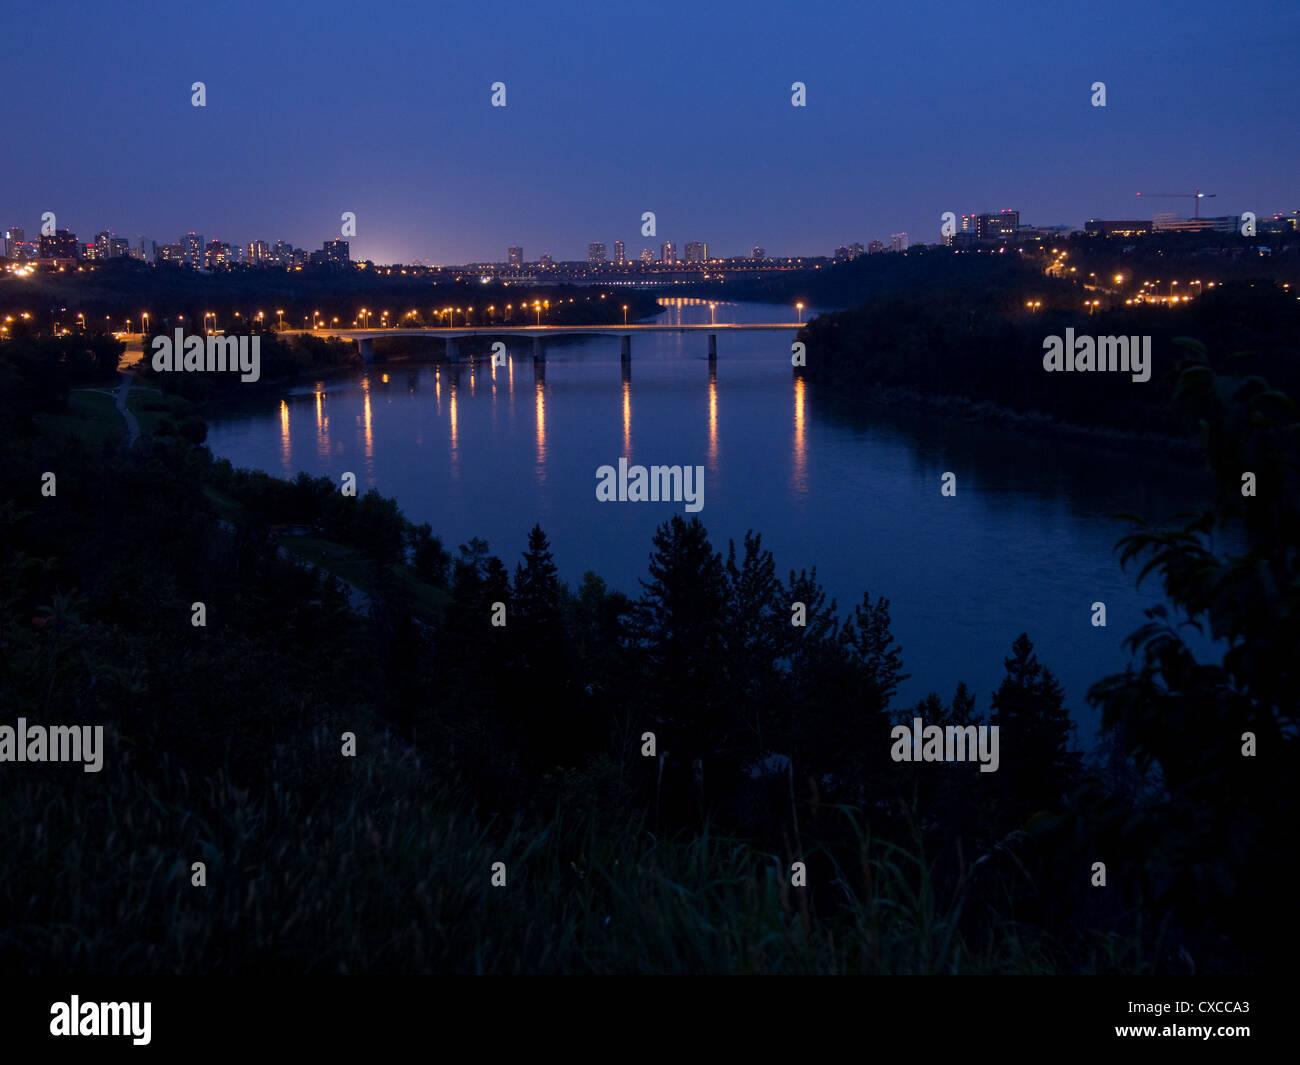 Edmonton Skyline at night featuring the bridges across the Saskatchewan  River. Lights glow in this evening view - Stock Image